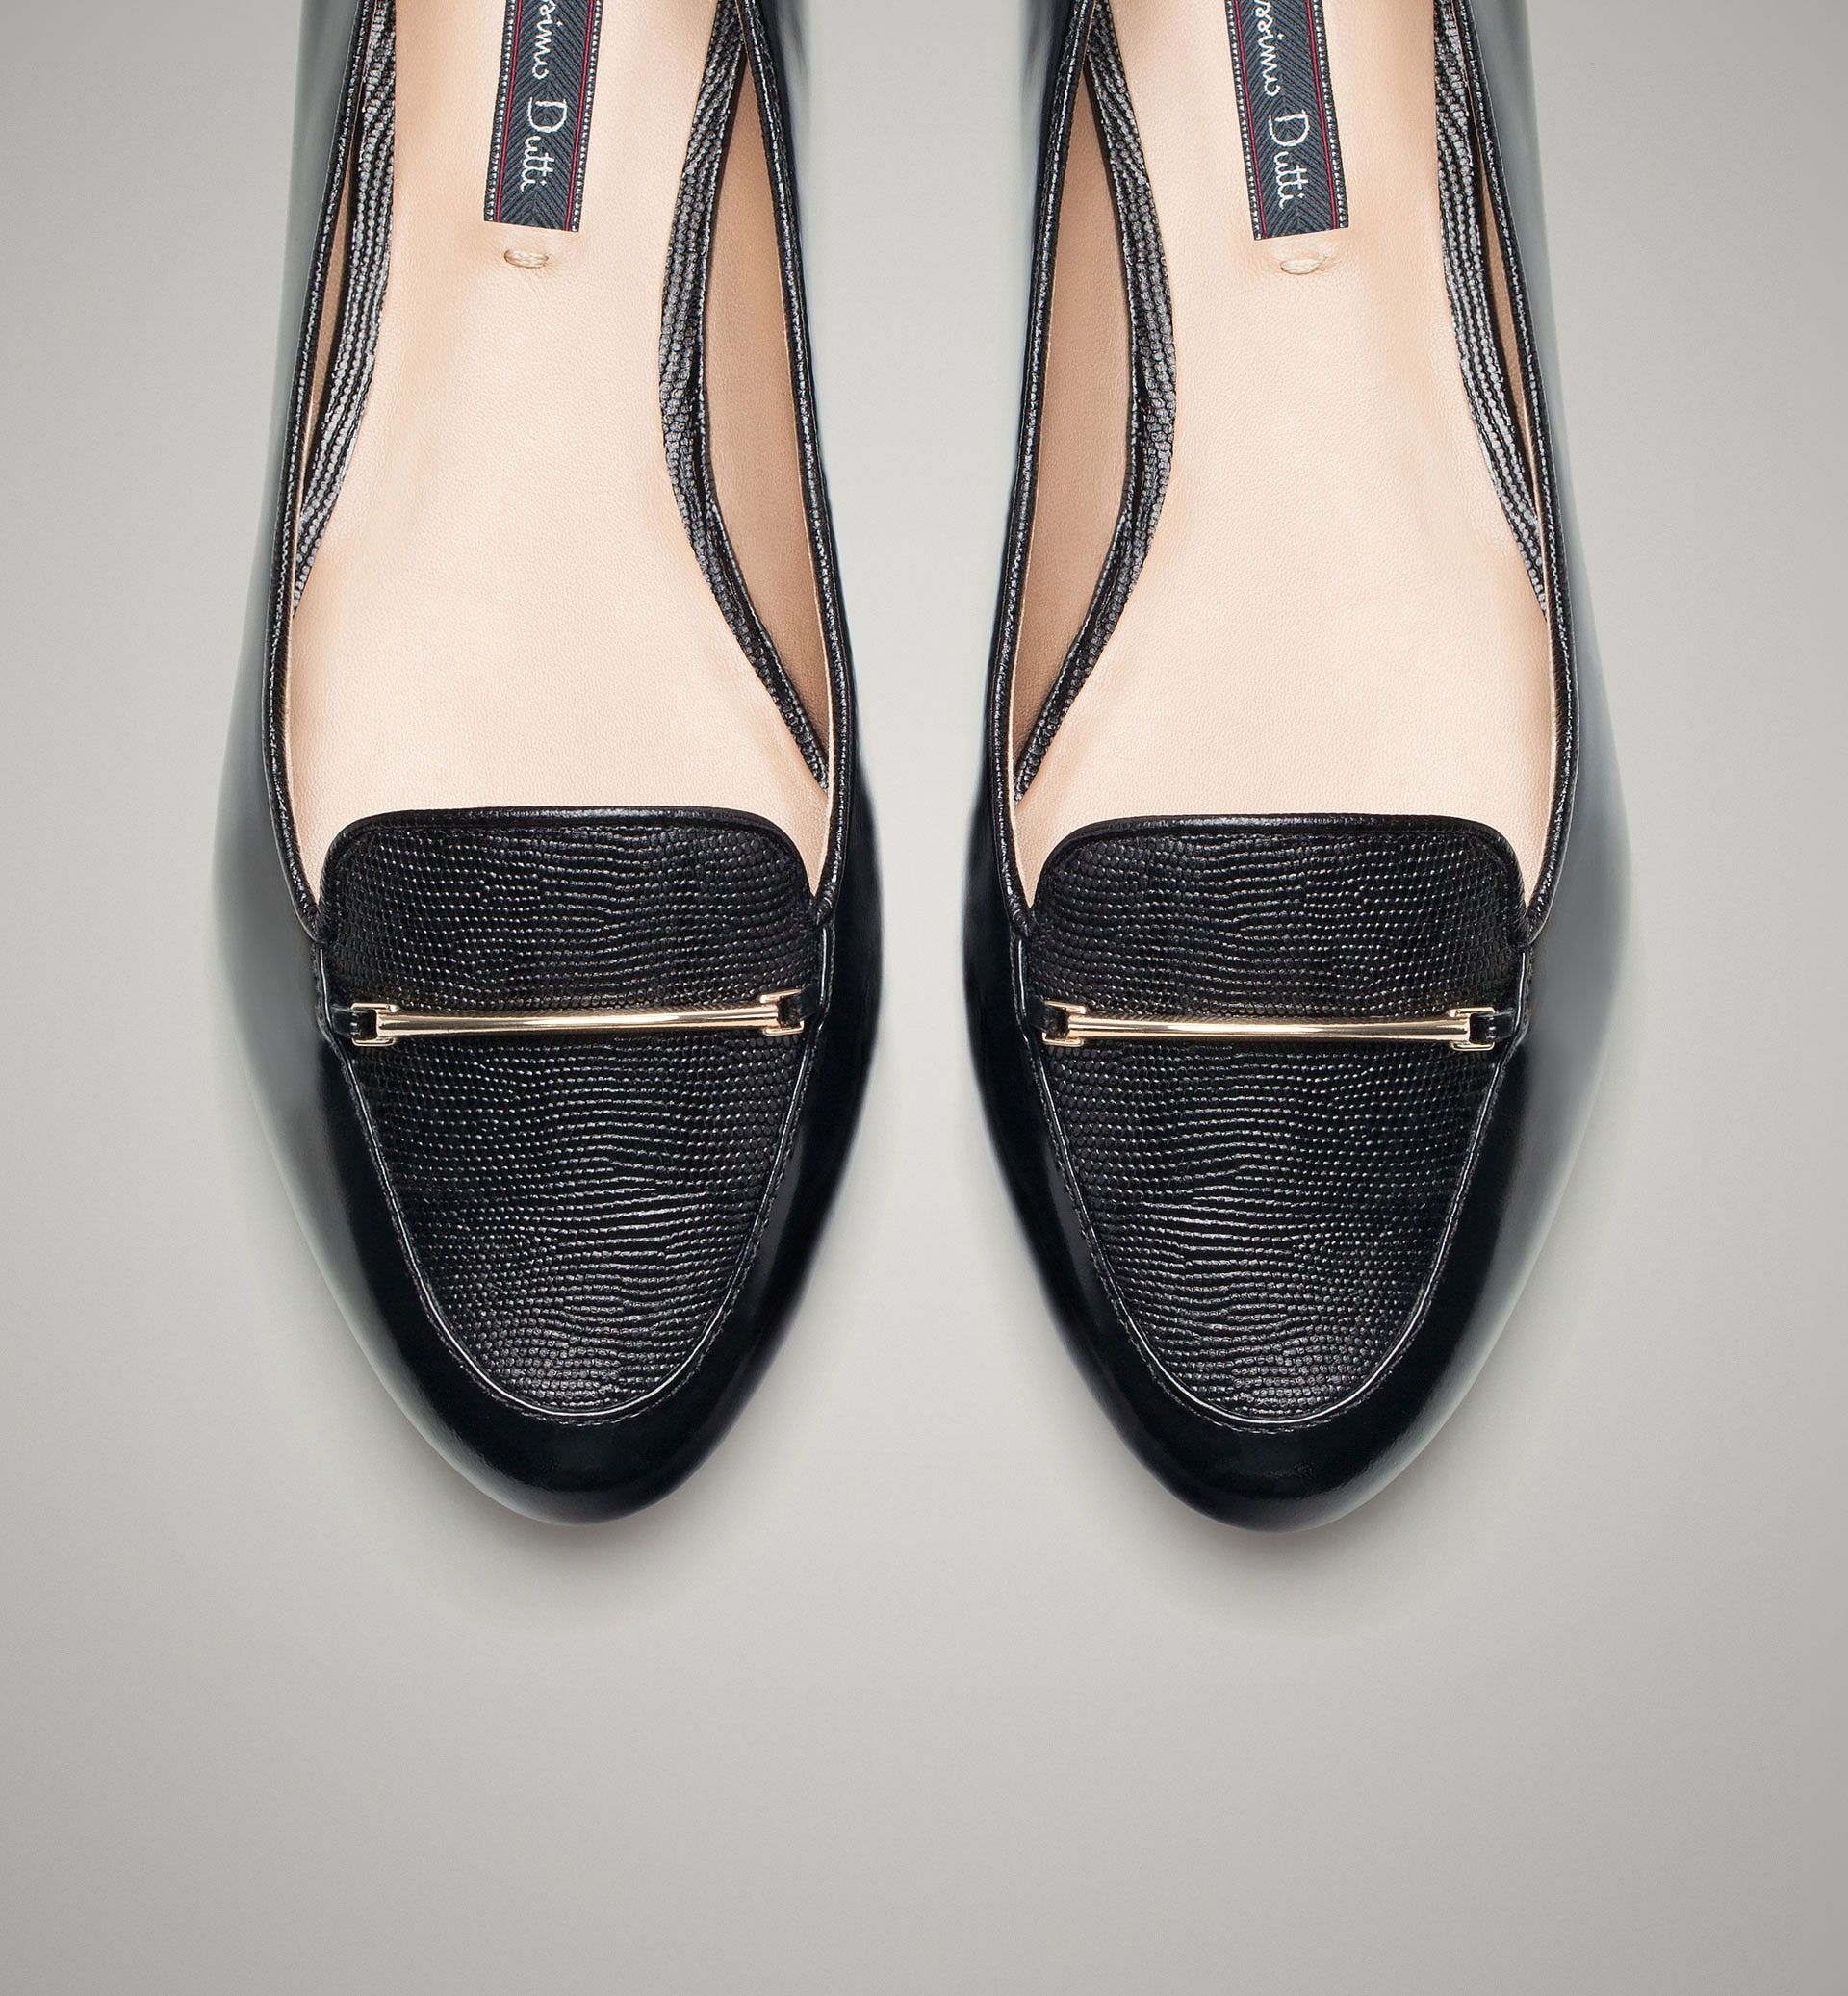 METALLIC ANTIK SLIPPER - View all - Shoes - WOMEN - Bosnia-Herzegovina